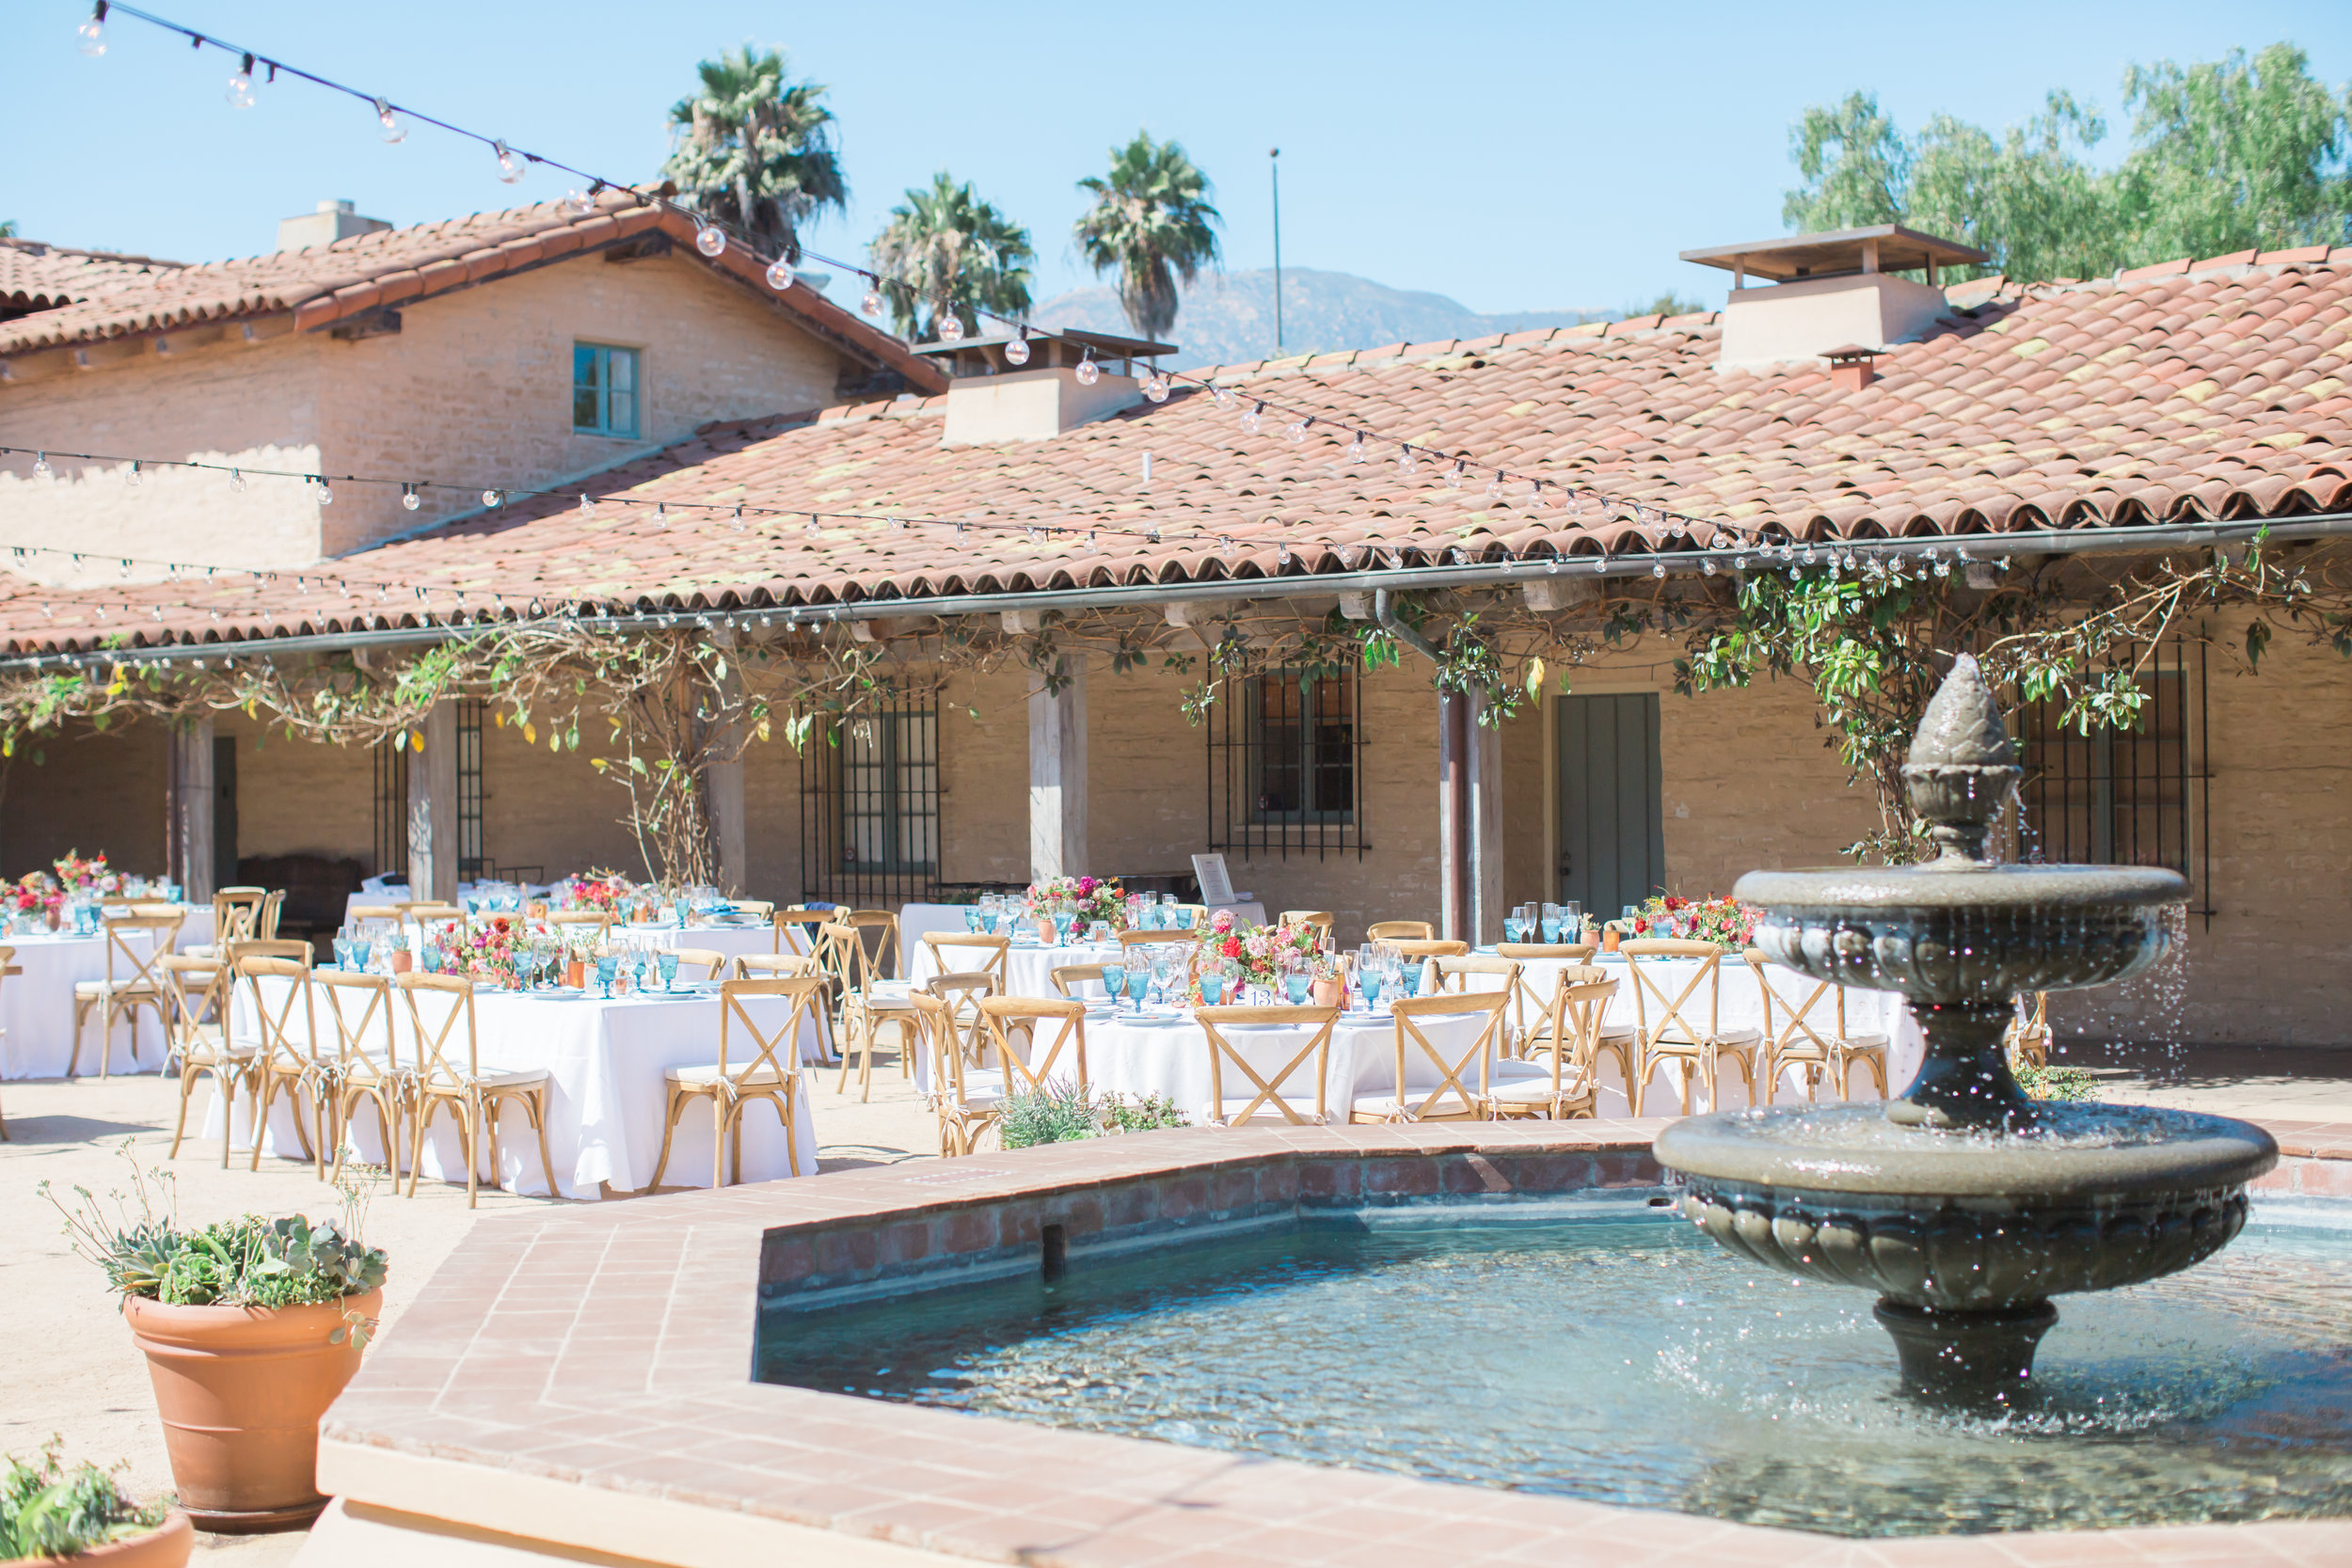 www.santabarbarawedding.com | James and Jess Photography | Santa Barbara Historical | Amazing Day Events | Classic Party Rentals | Bella Vista Designs | La Tavola | Reception Venue